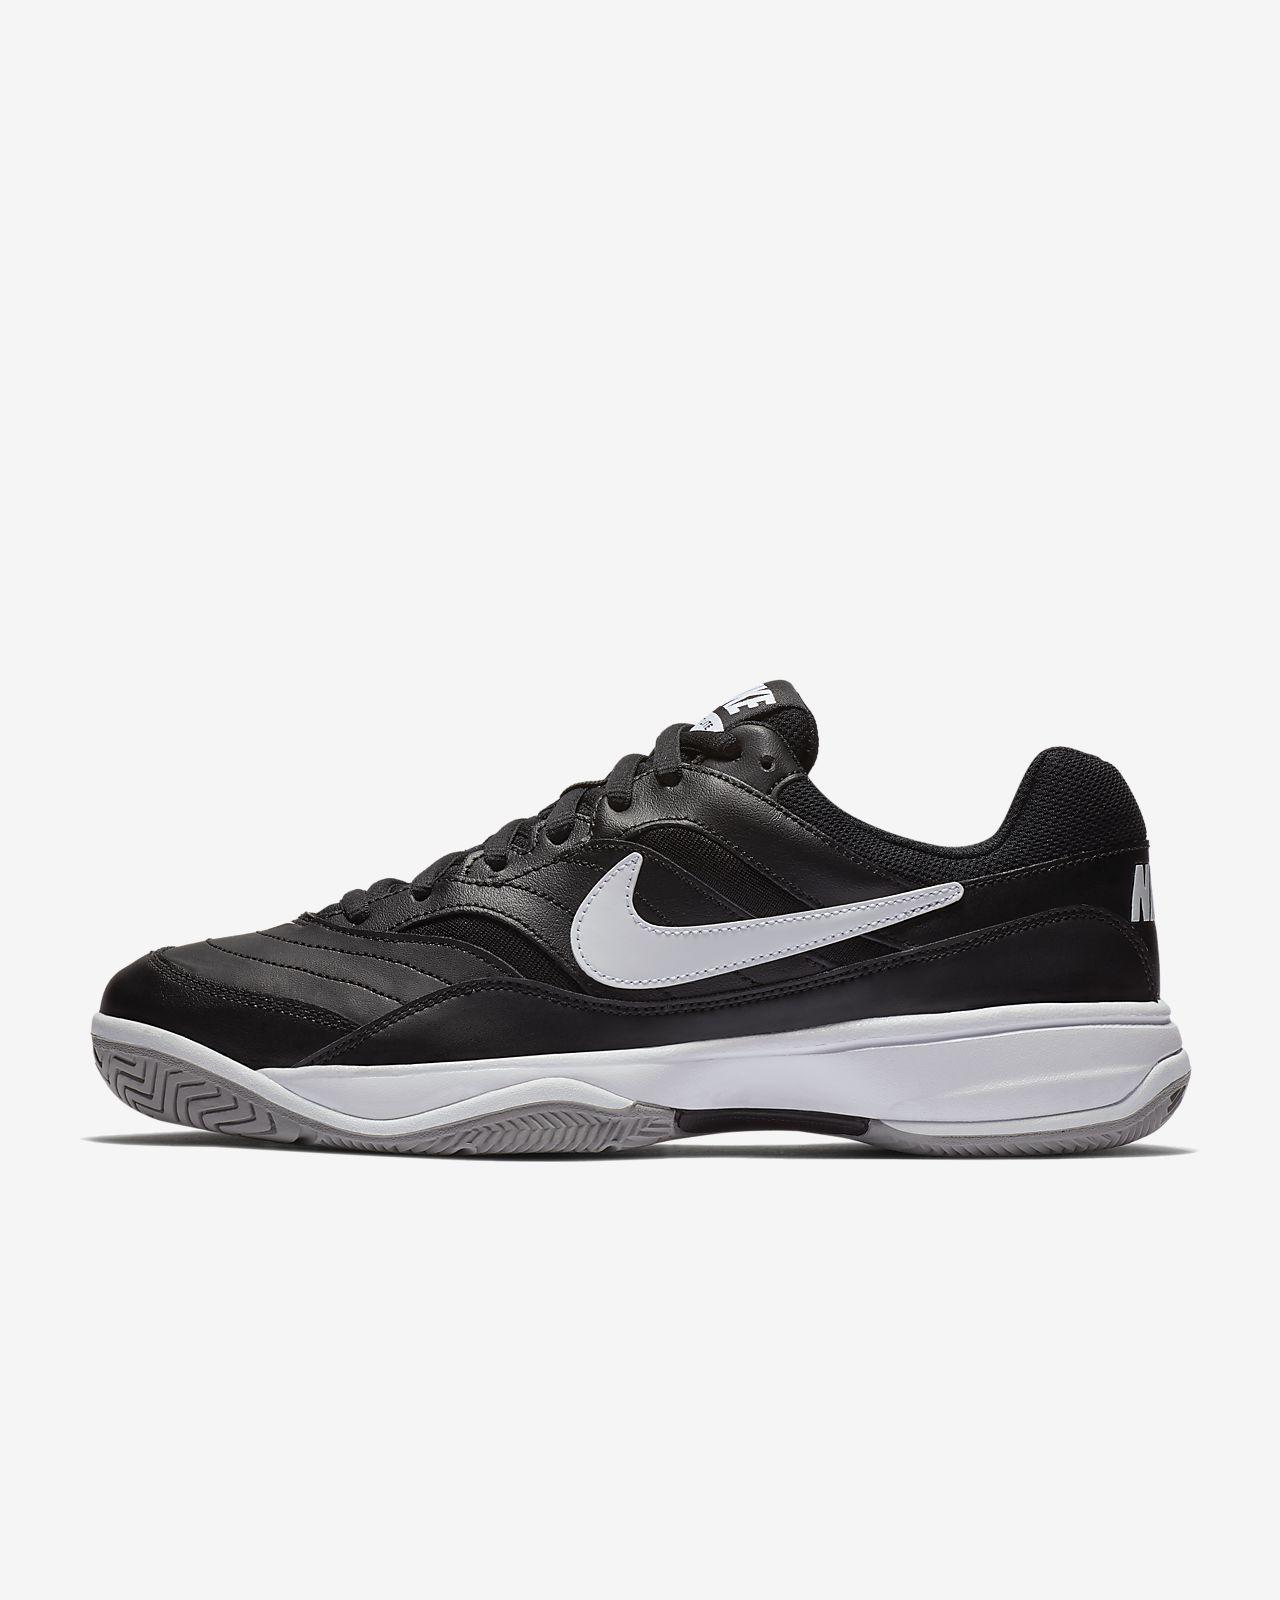 NikeCourt Lite (Wide) Men s Tennis Shoe. Nike.com 6bbebb8d5